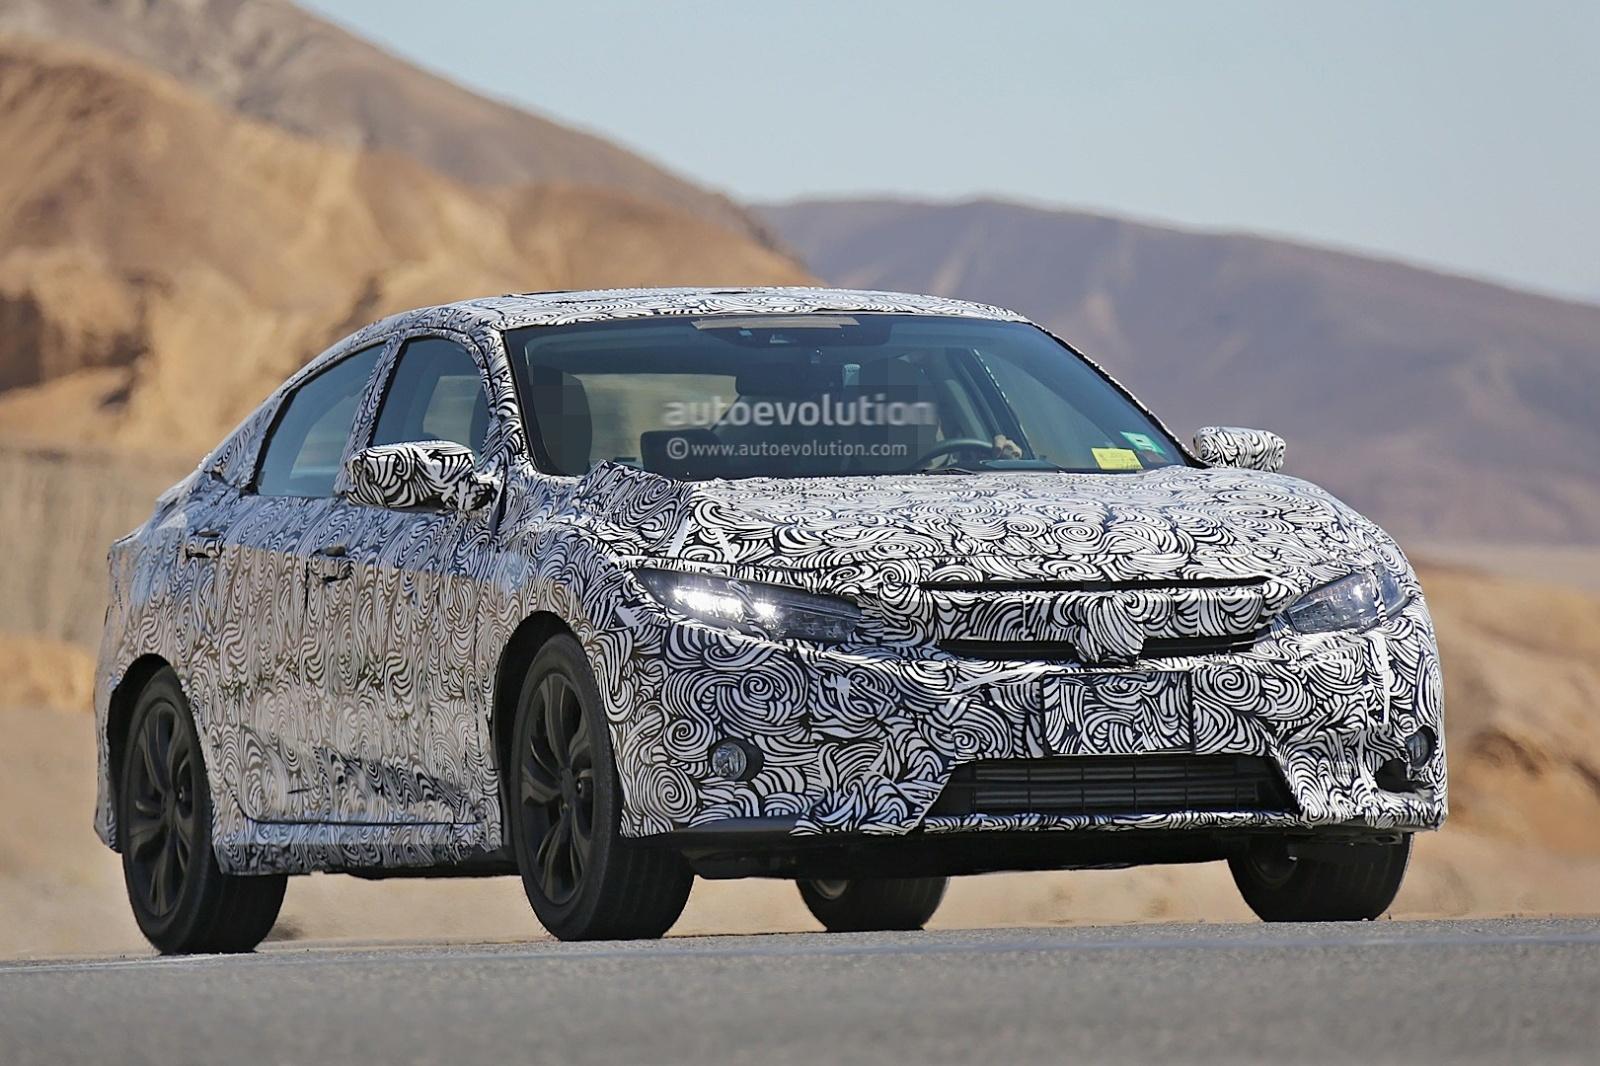 spyshots-next-gen-2017-honda-civic-sedan-interior-revealed-new-exterior-details-shown_28